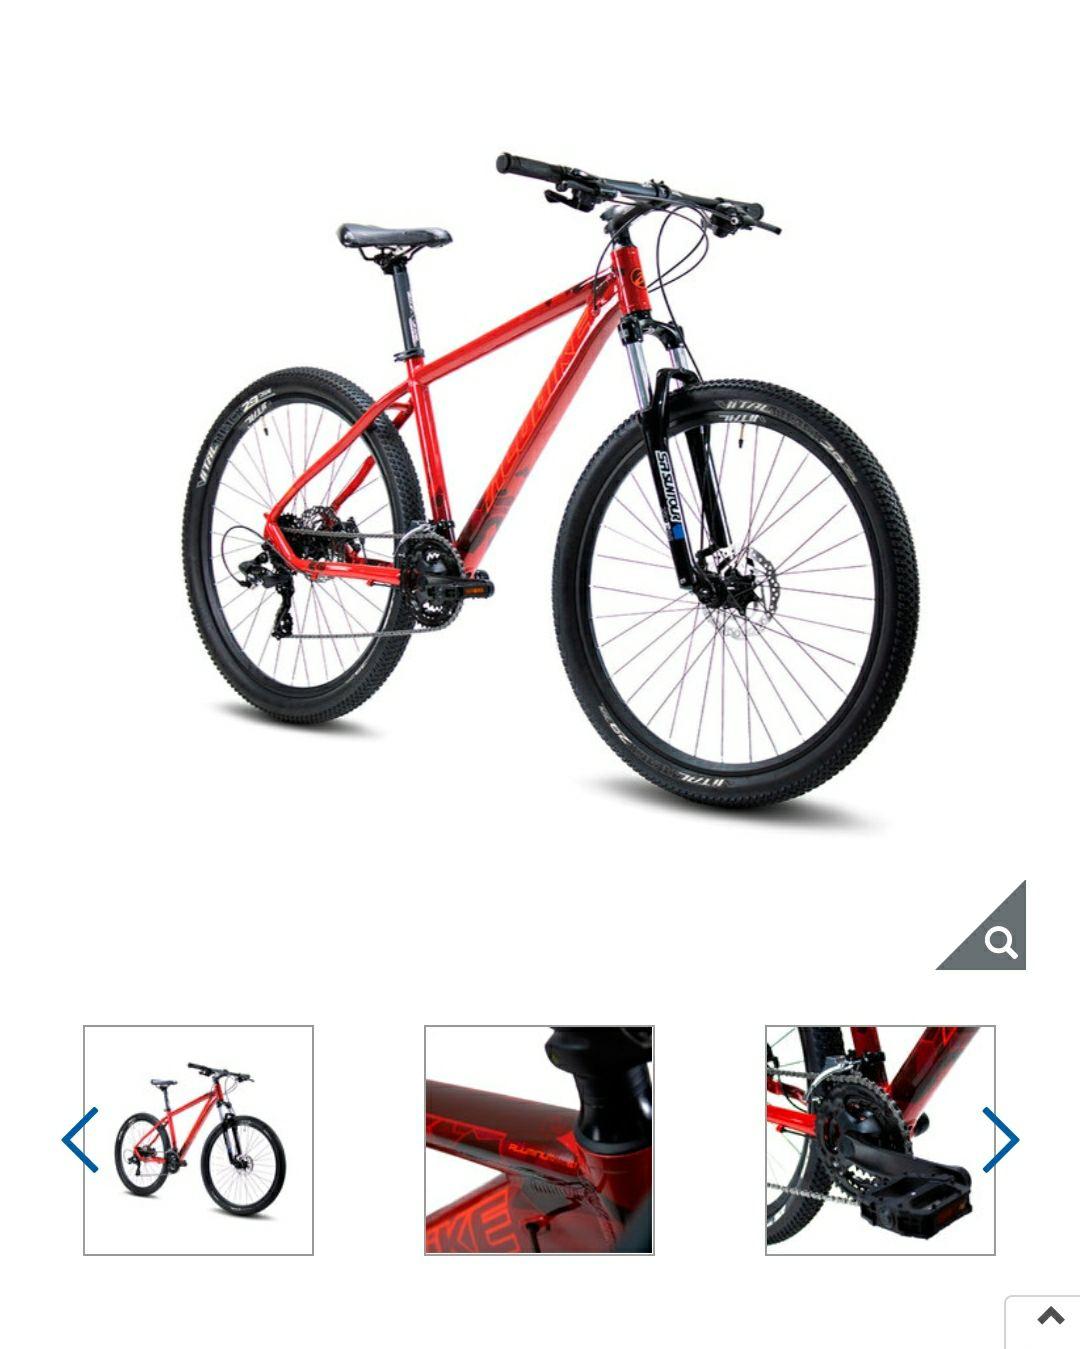 Costco: Bicicleta de Montaña R29 Alubike Sierra